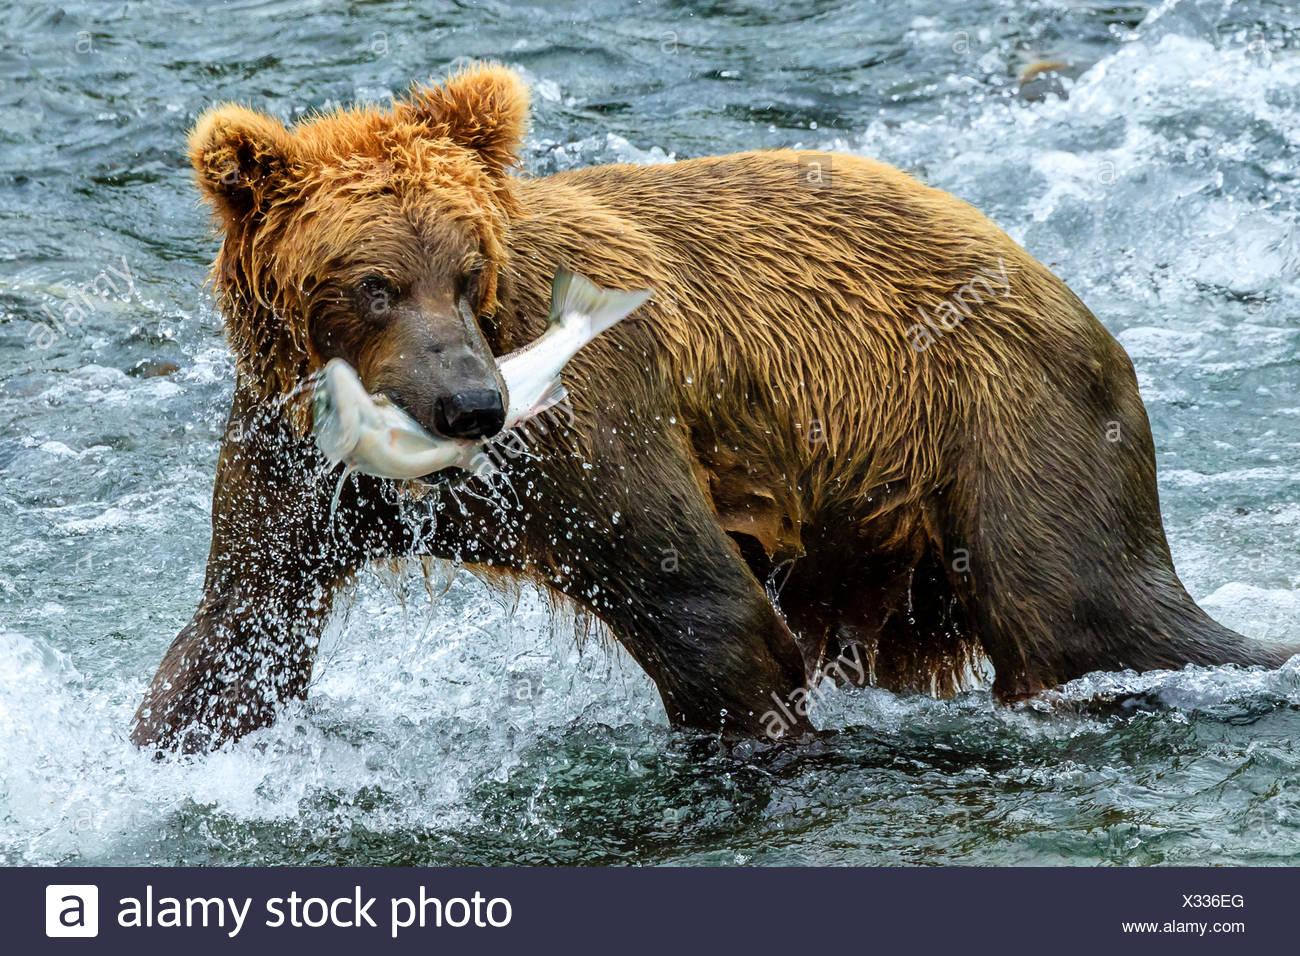 Yearling brown bear, Ursus arctos, catches a sockeye salmon below Brooks Falls. - Stock Image